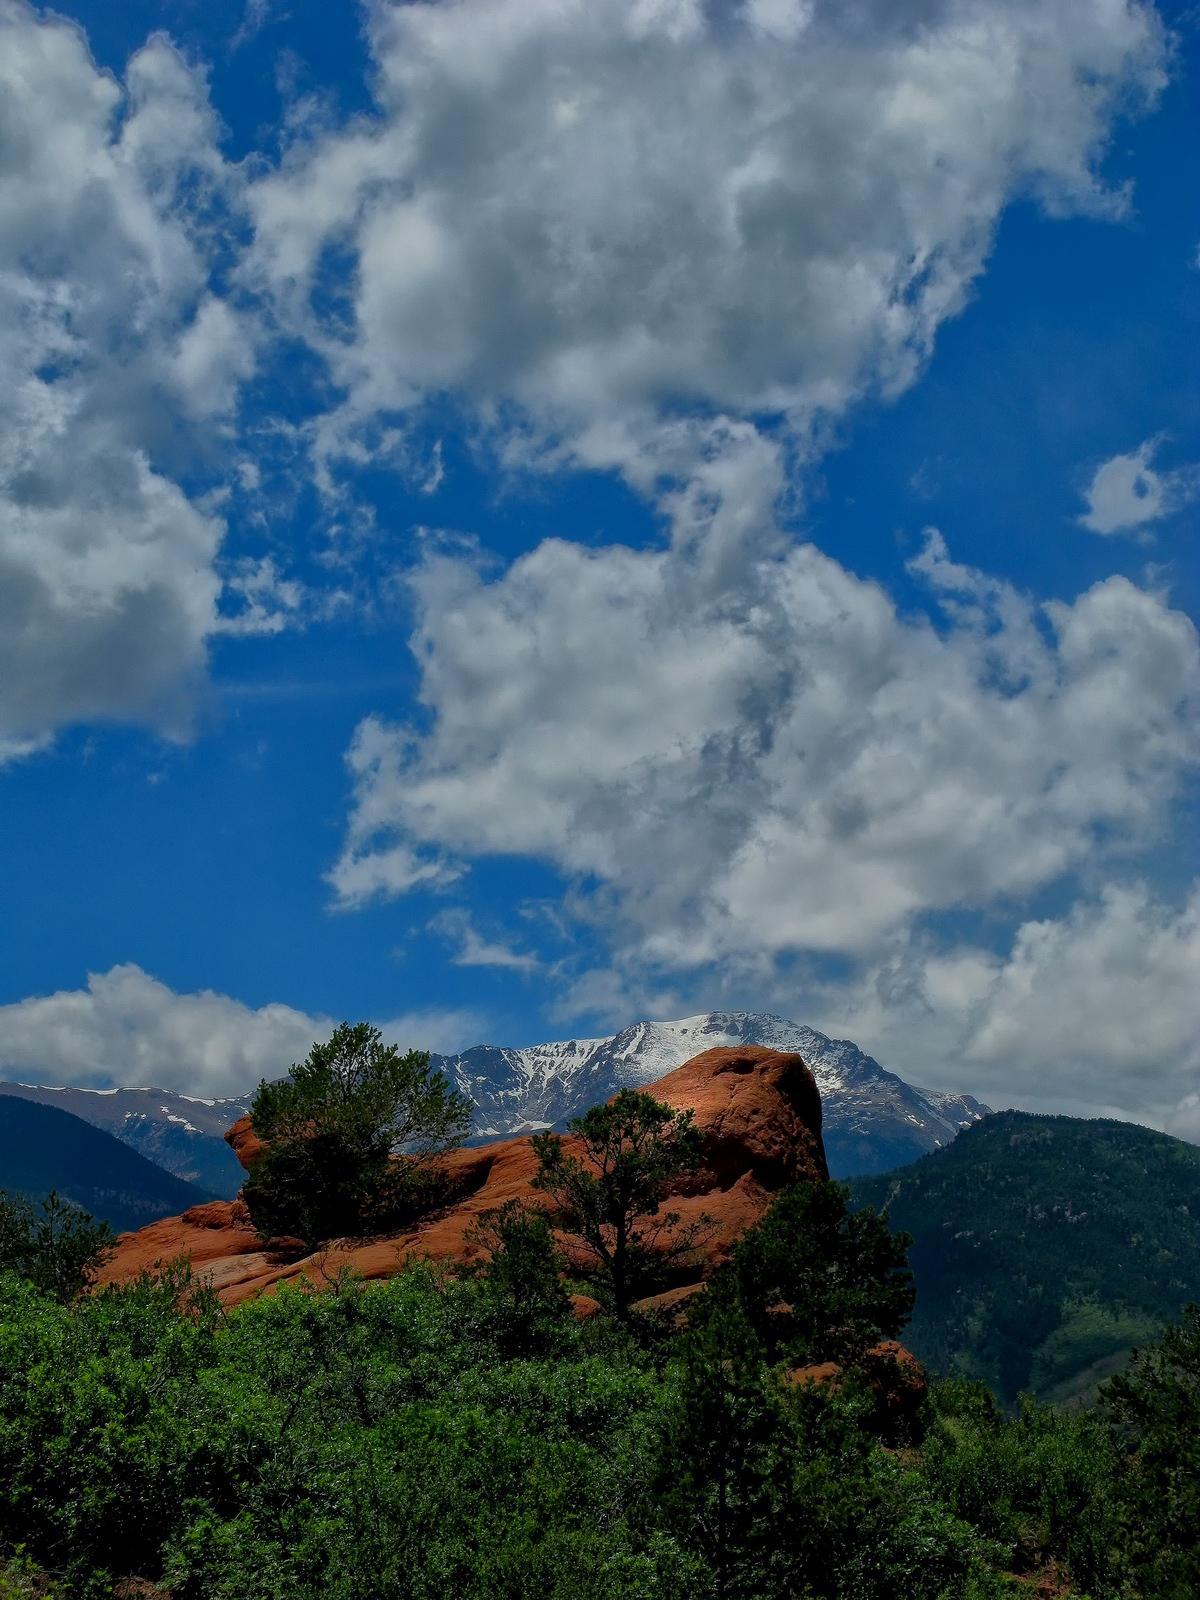 colarado, colarado springs, garden of the gods, pikes peak, , photo